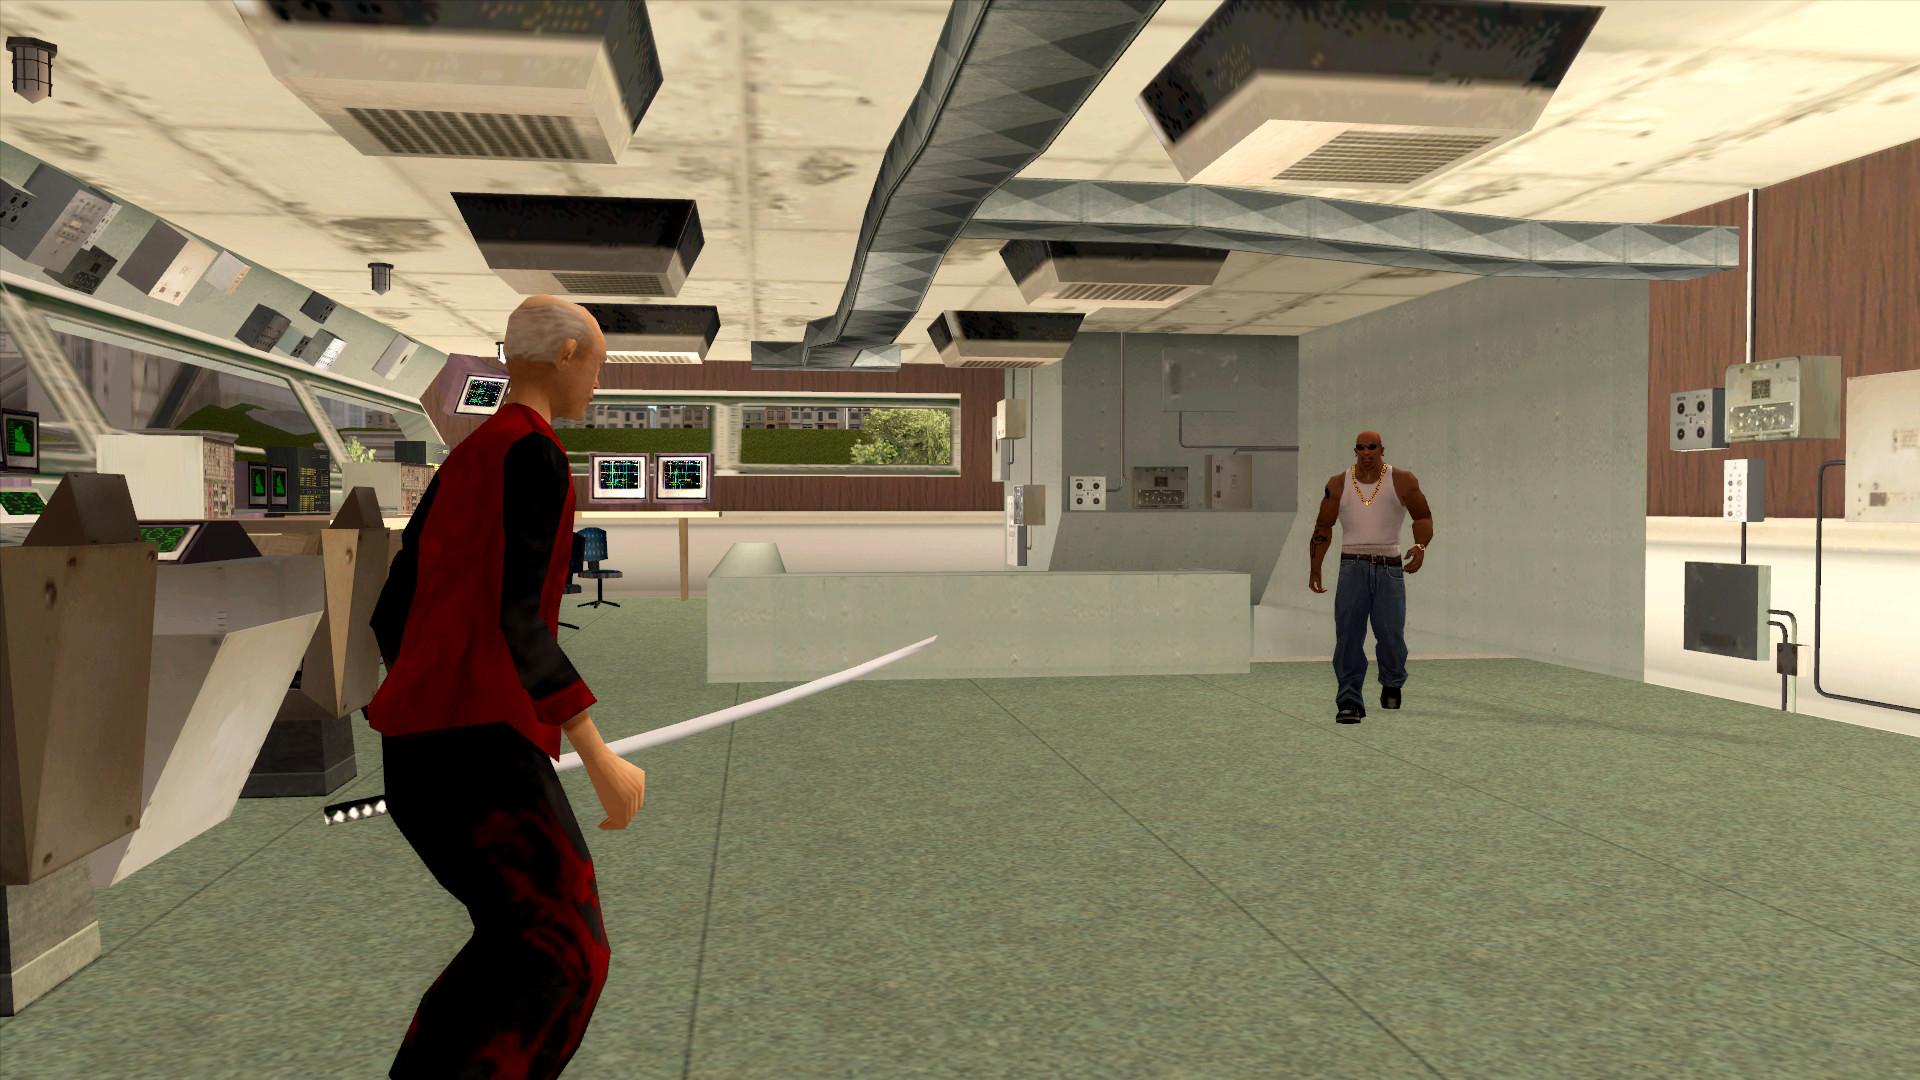 gta_sa 2016-05-14 12-21-08-98.jpg - Grand Theft Auto: San Andreas